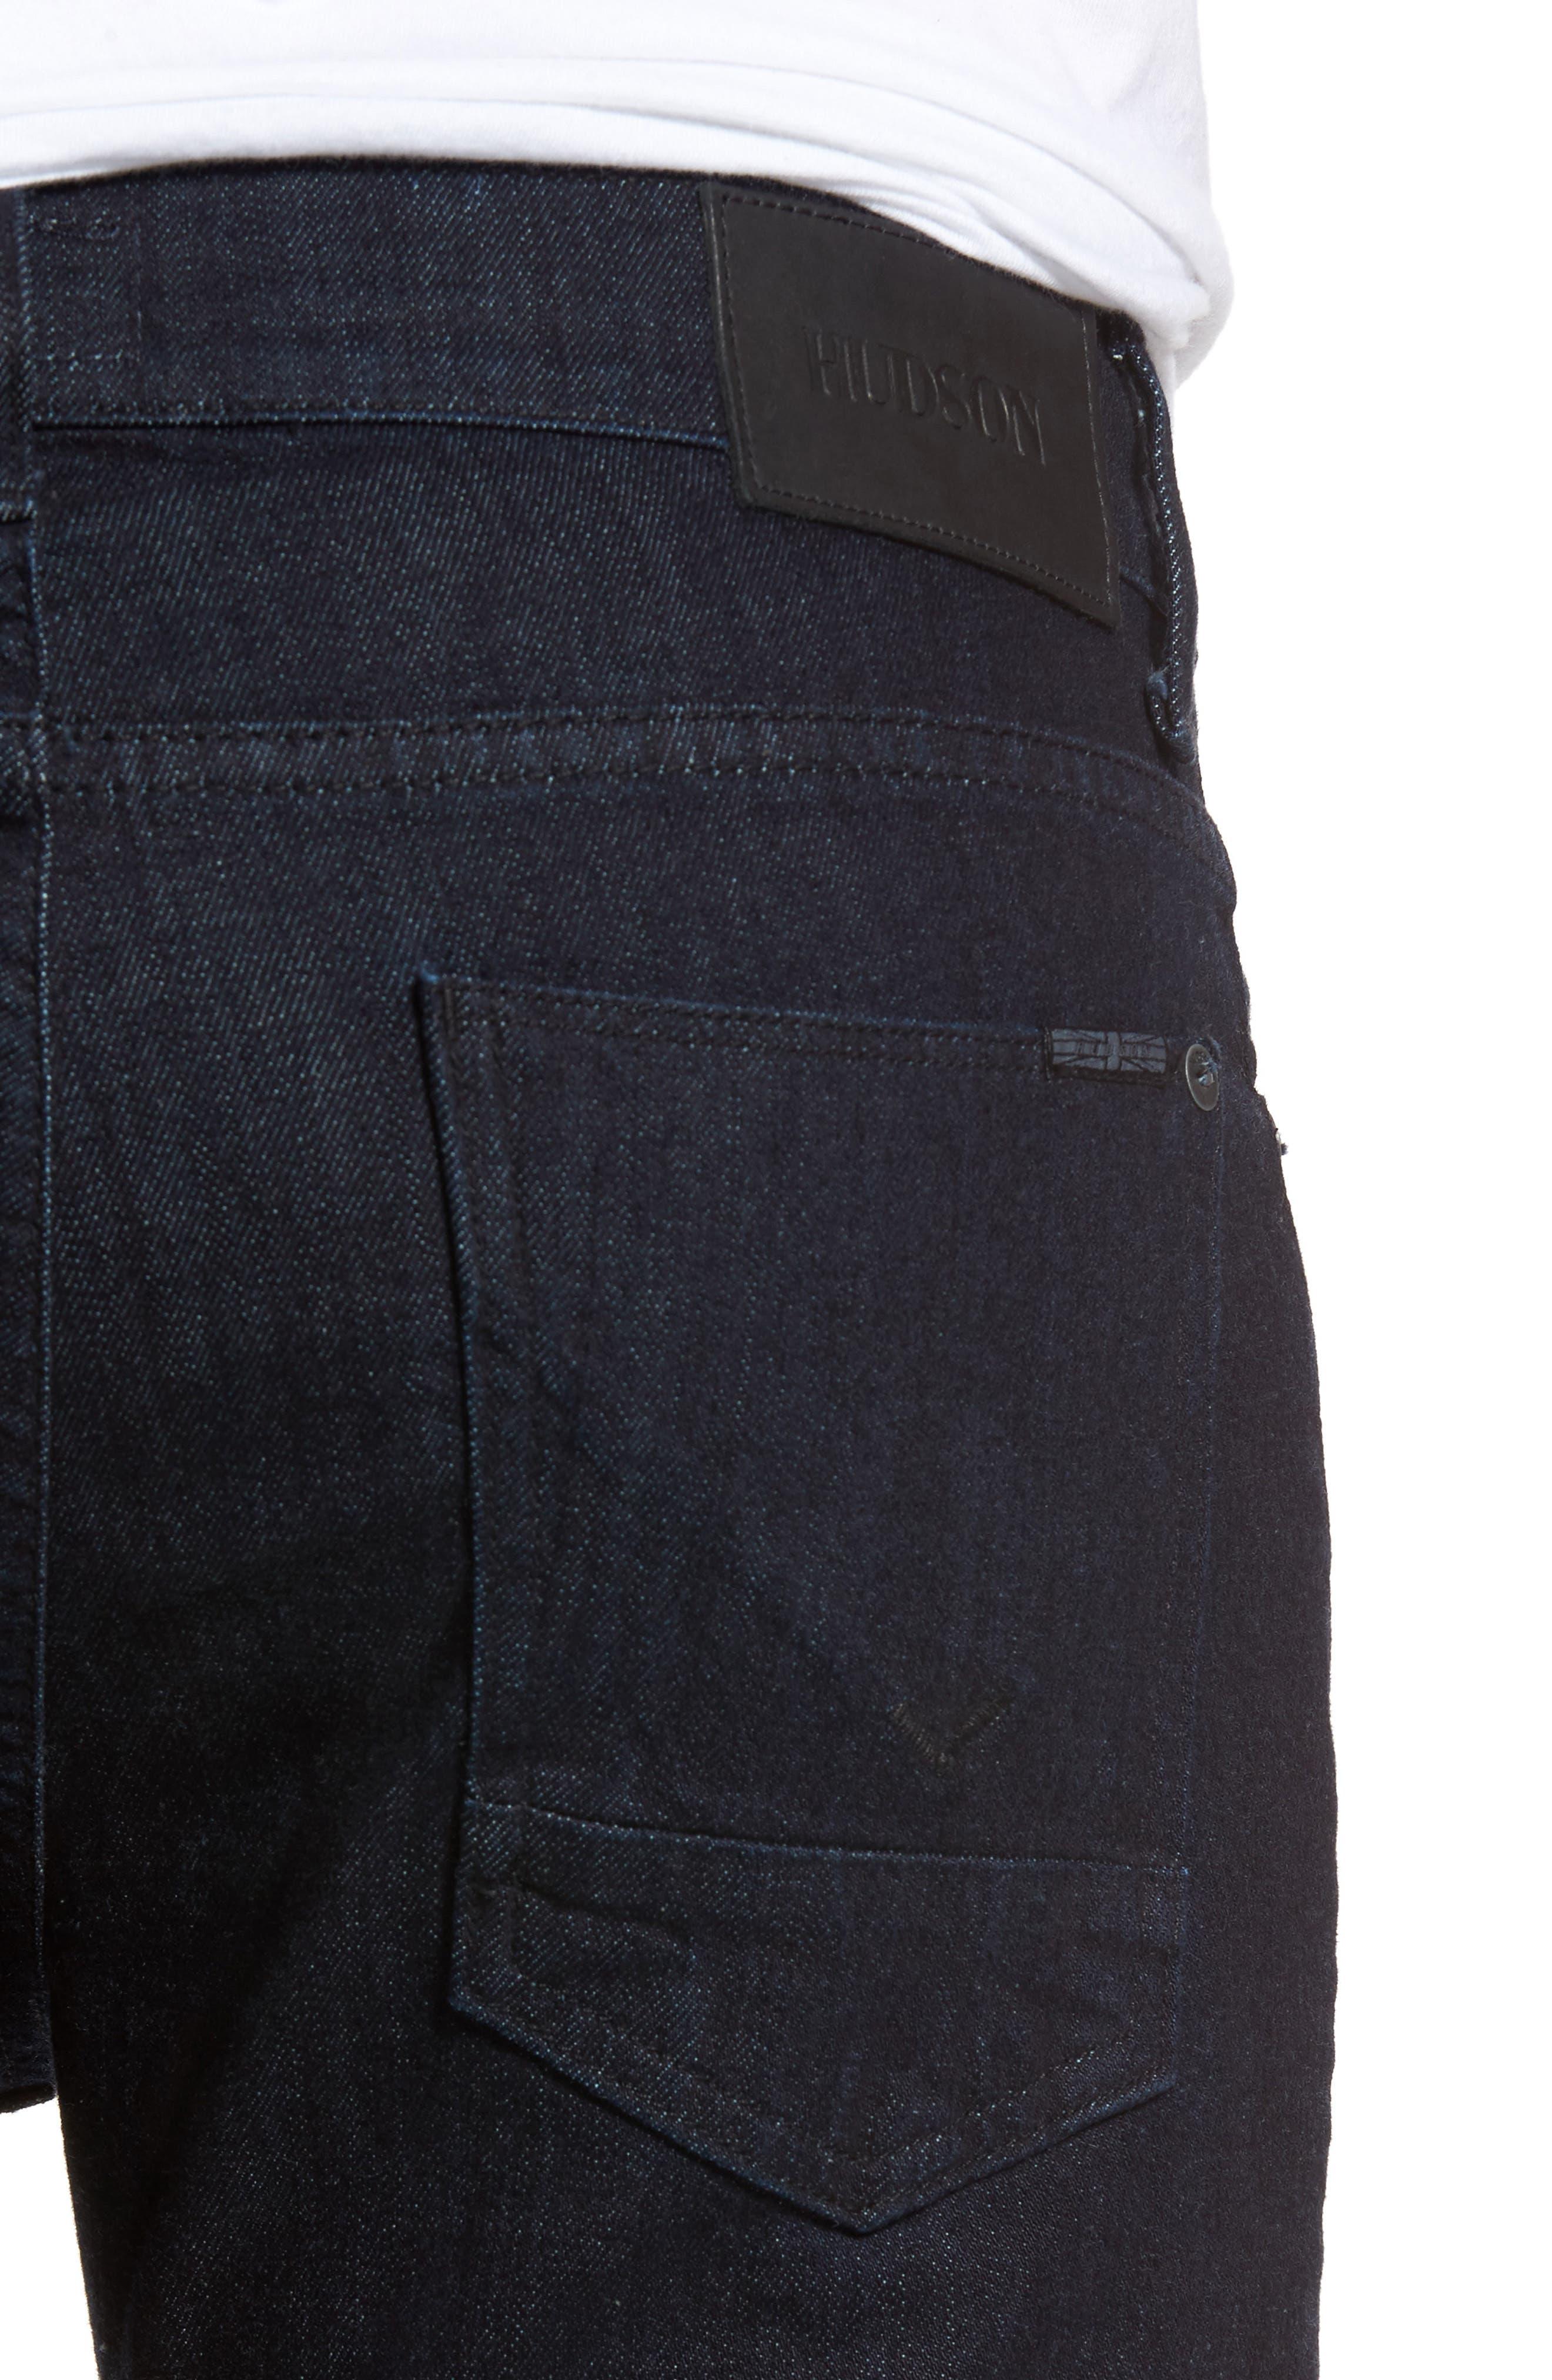 Alternate Image 4  - Hudson Jeans Axl Skinny Fit Jeans (Firestone)